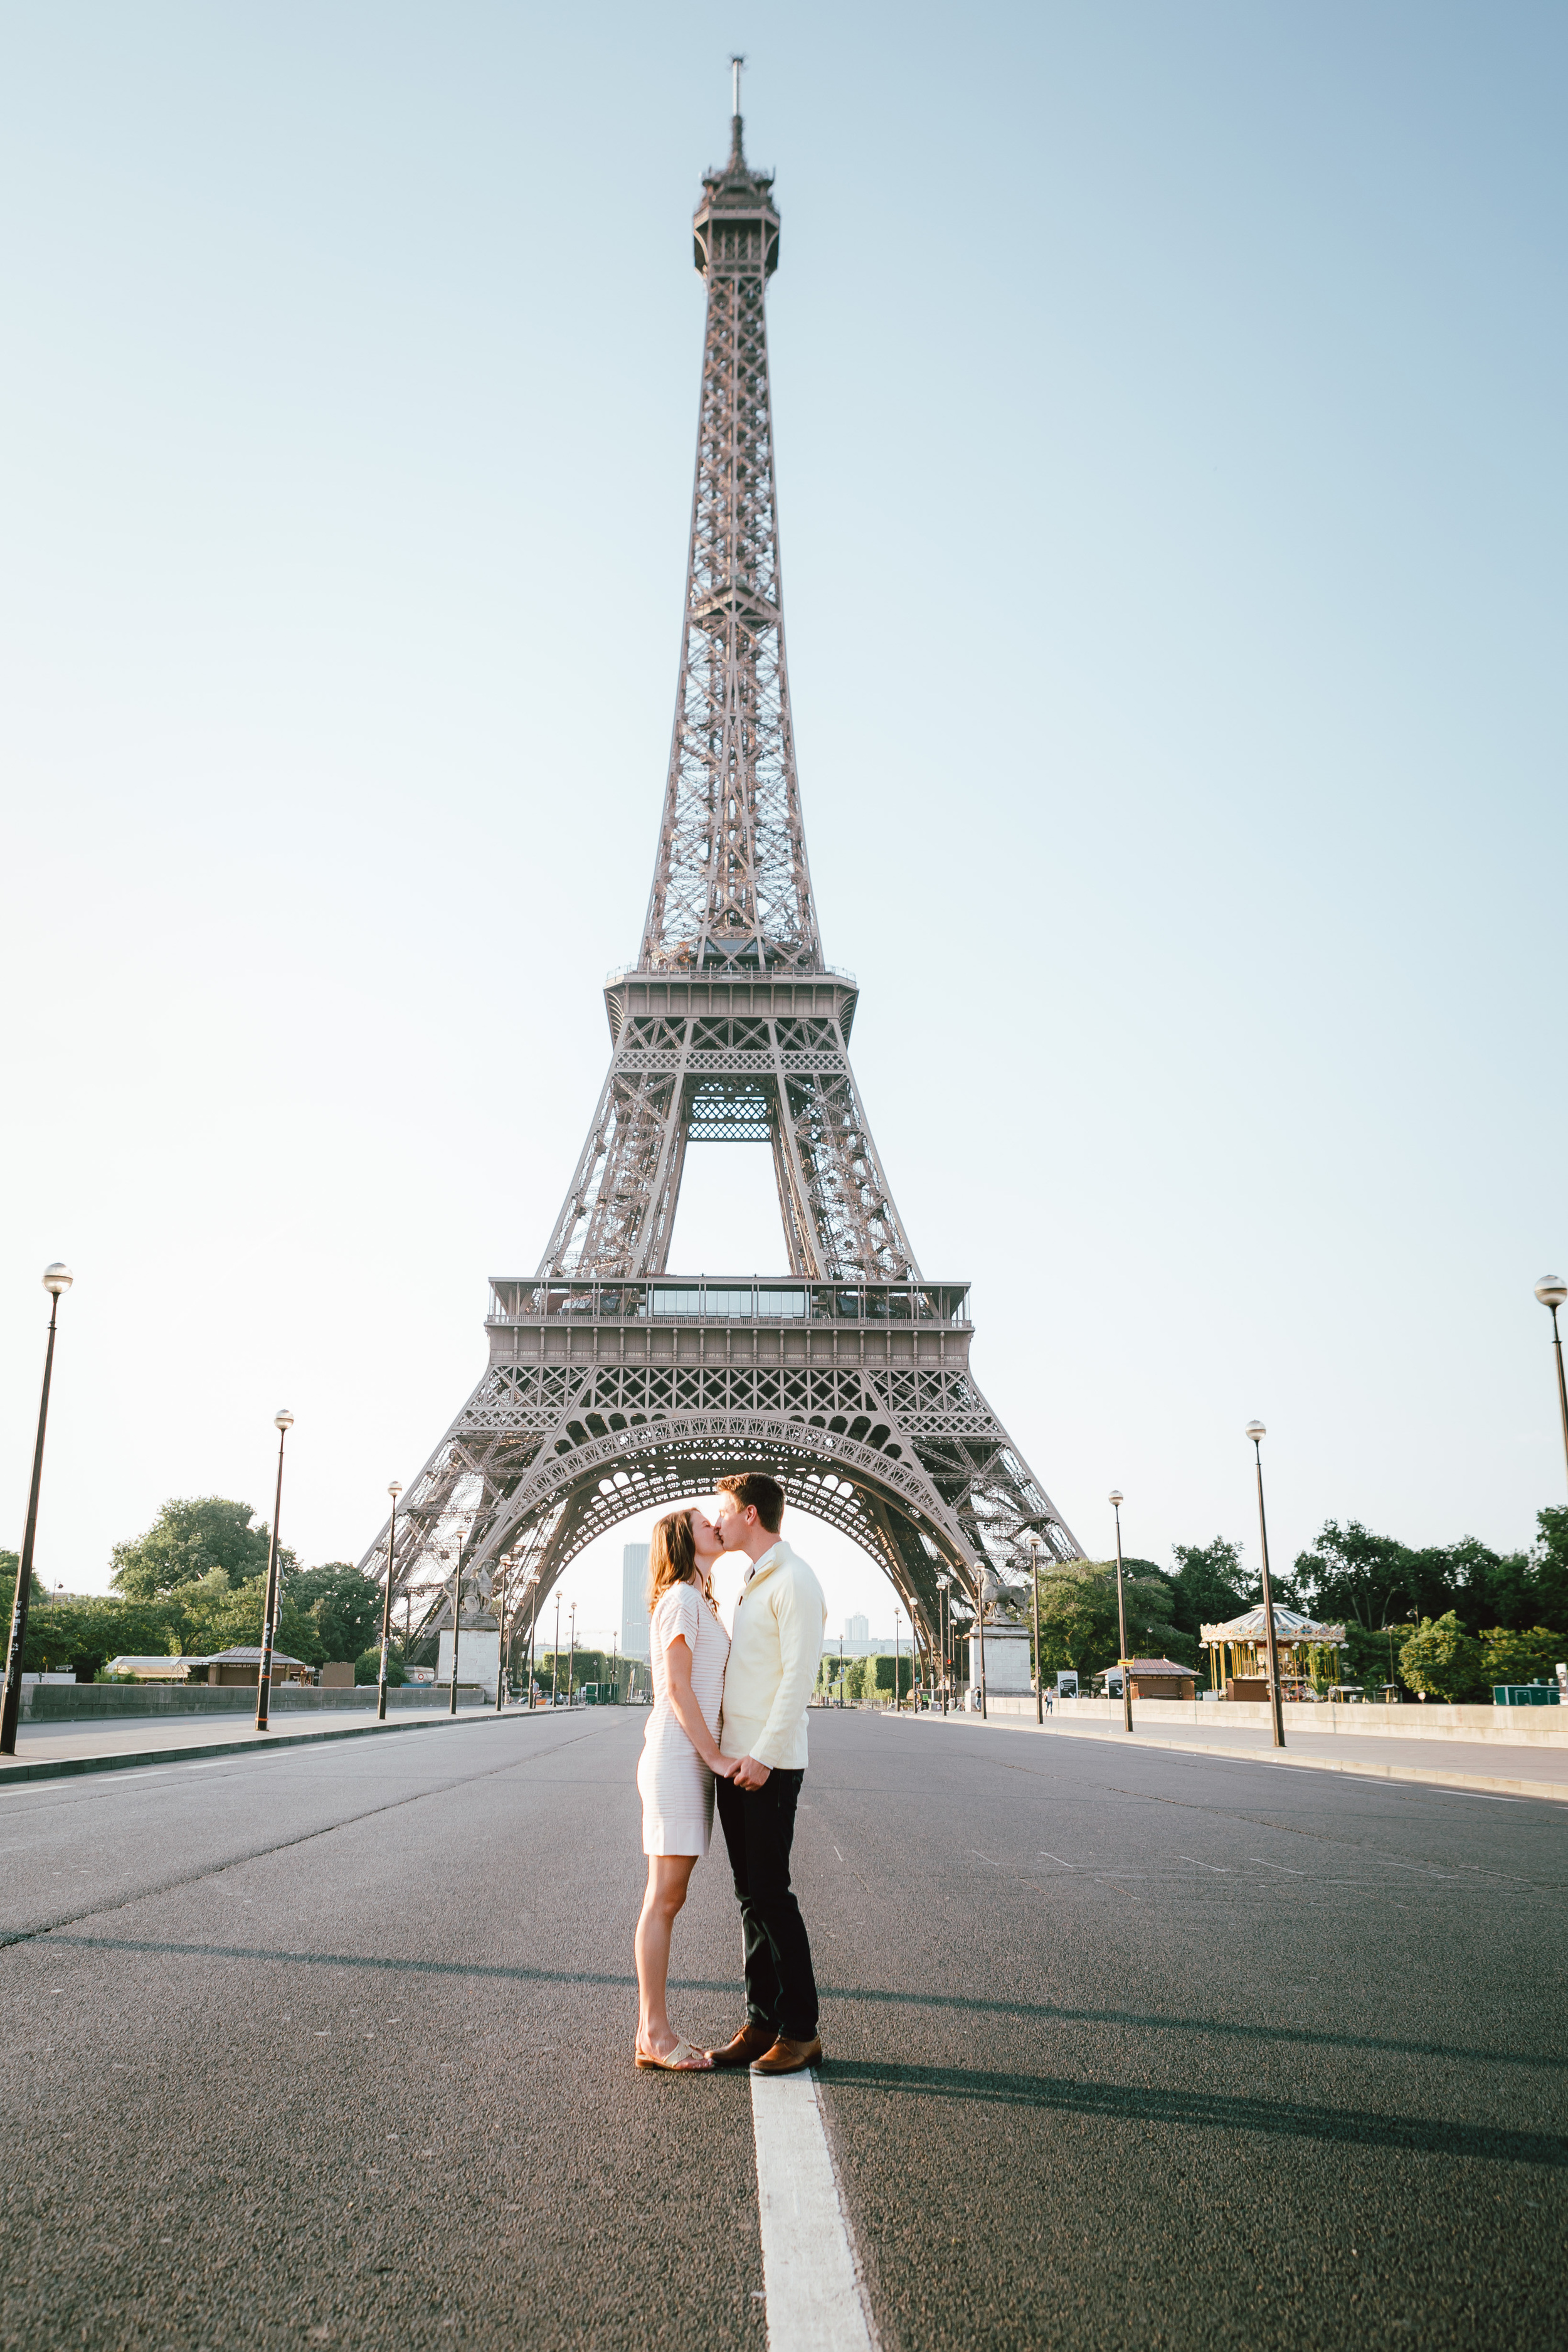 Paris-Photographer-Eiffel-Tower-Propose-in-Paris-Kiss-Eiffel-Iena-Iheartparisfr.jpg